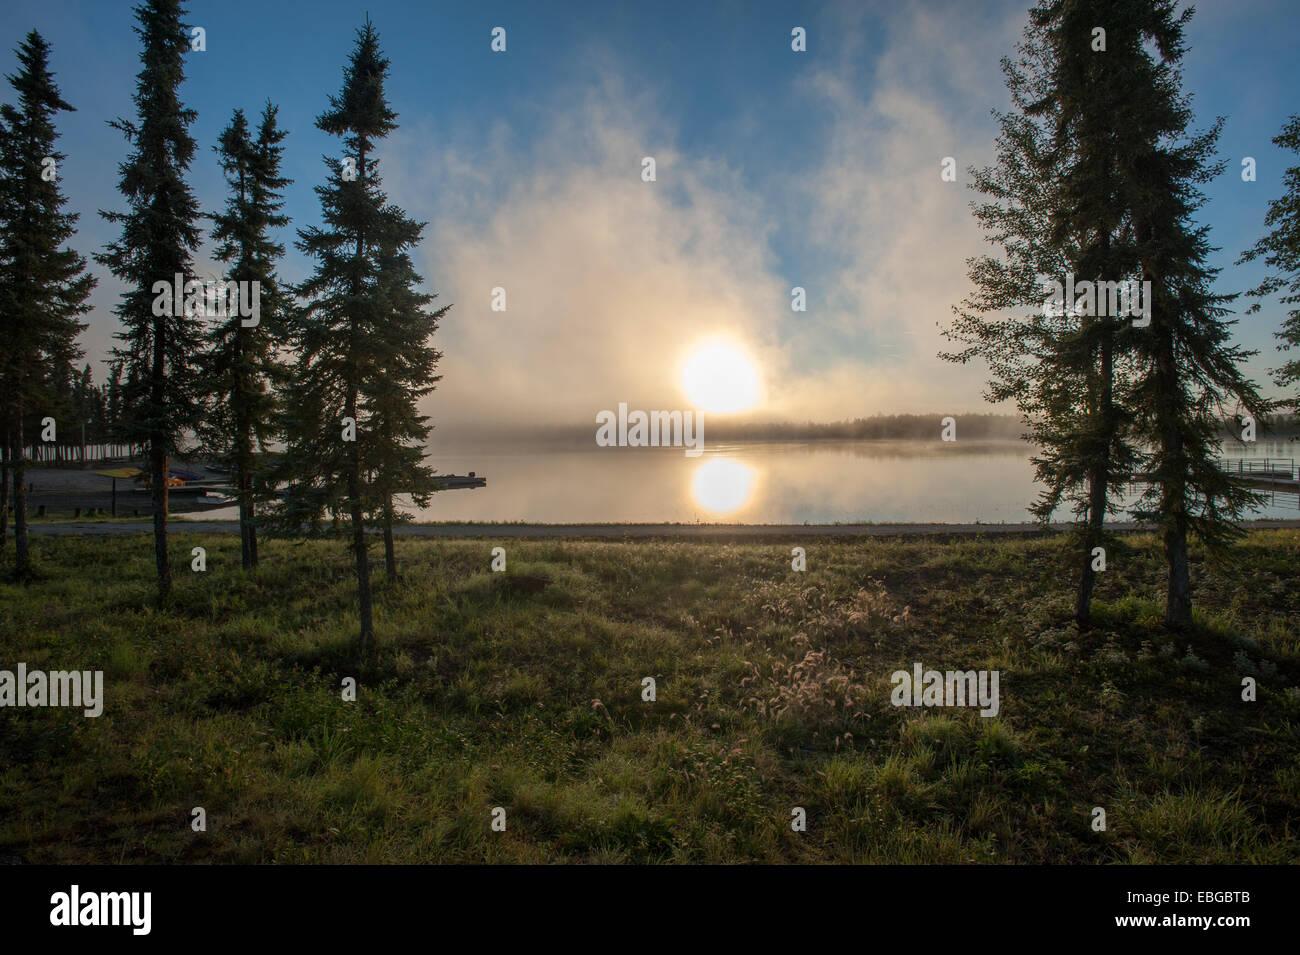 Sunset over Chena laghi area ricreativa, Alaska Immagini Stock